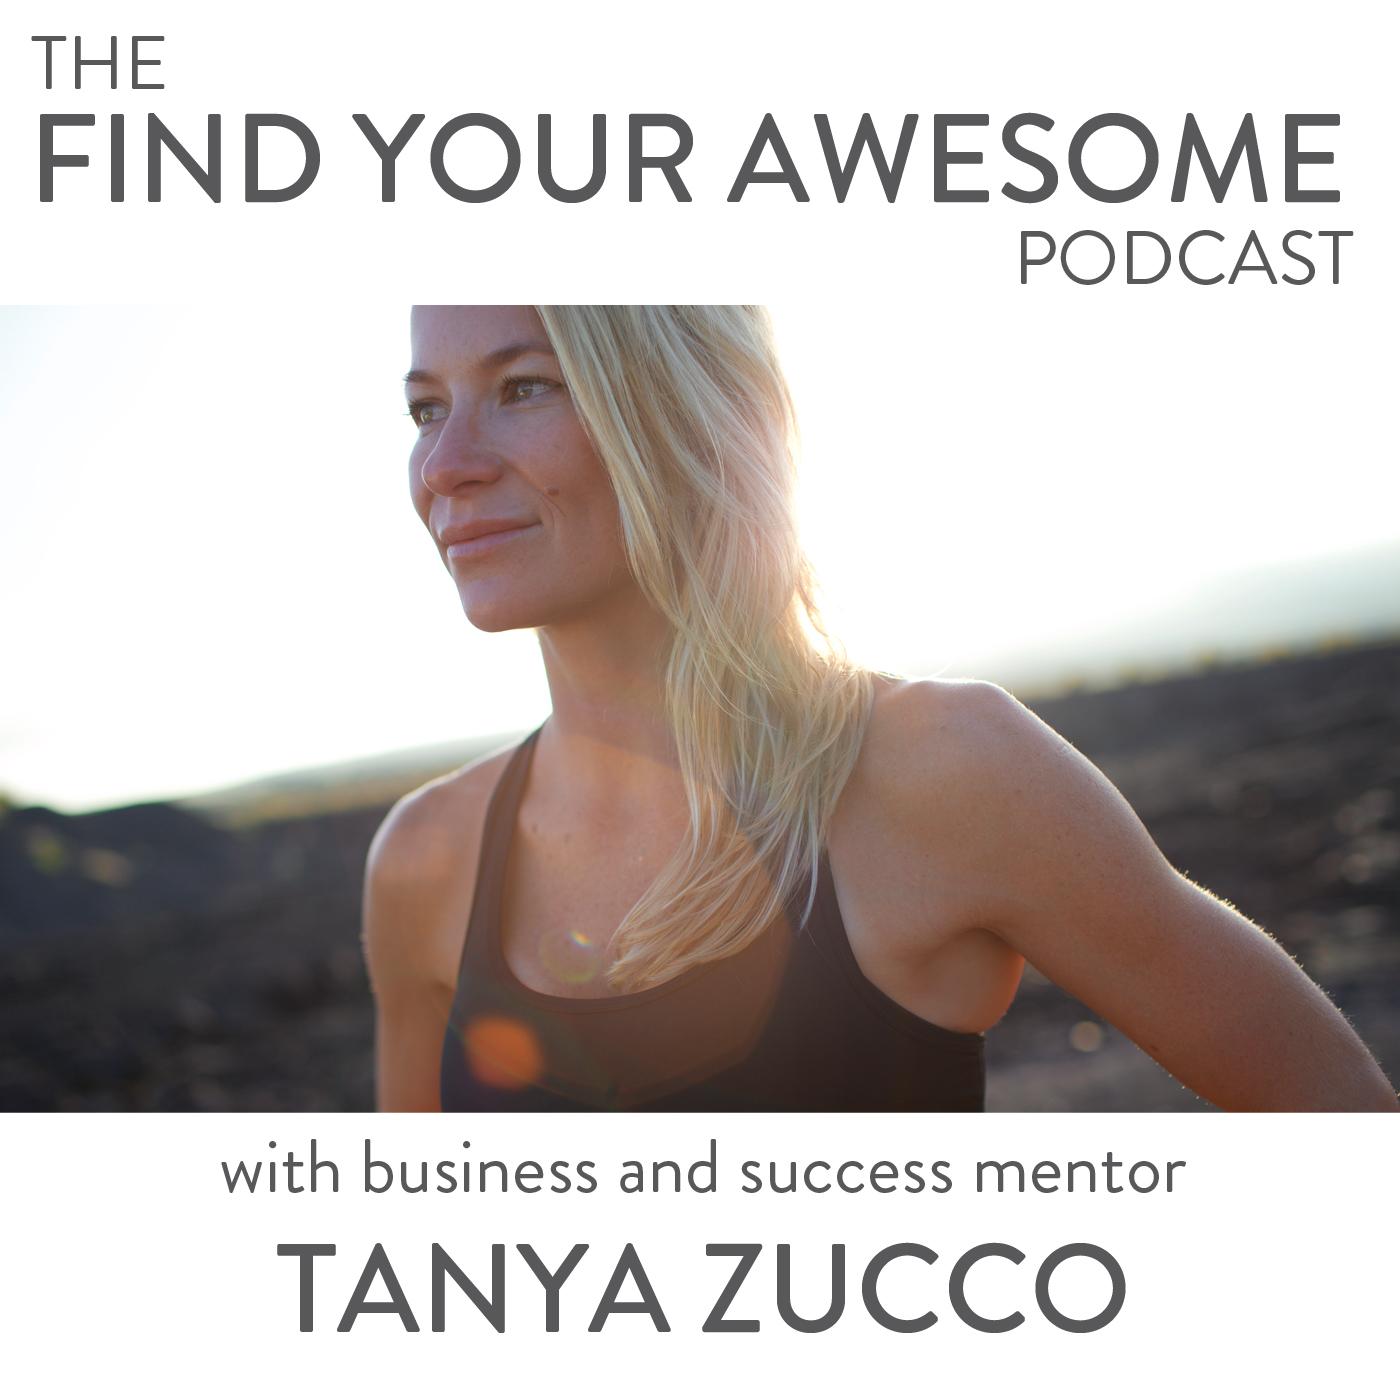 TanyaZucco_podcast_coverart (1).jpg